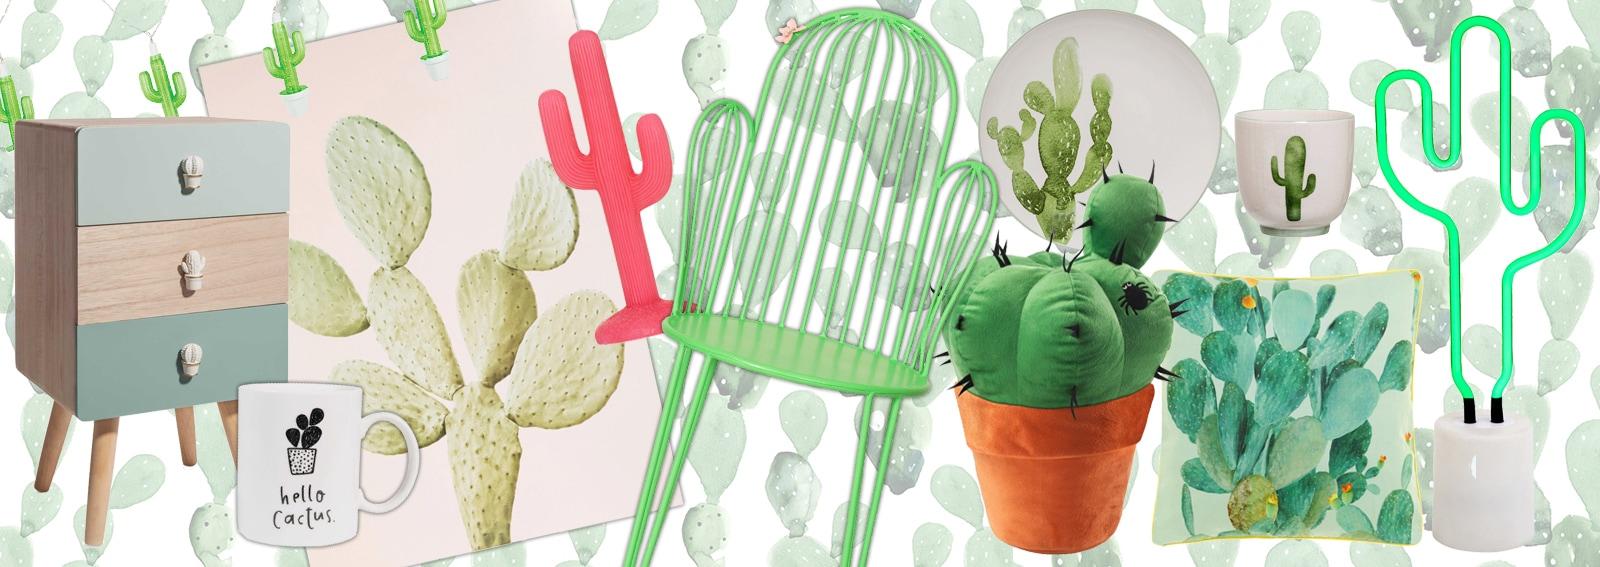 cover-cactus-home-decor-desktop